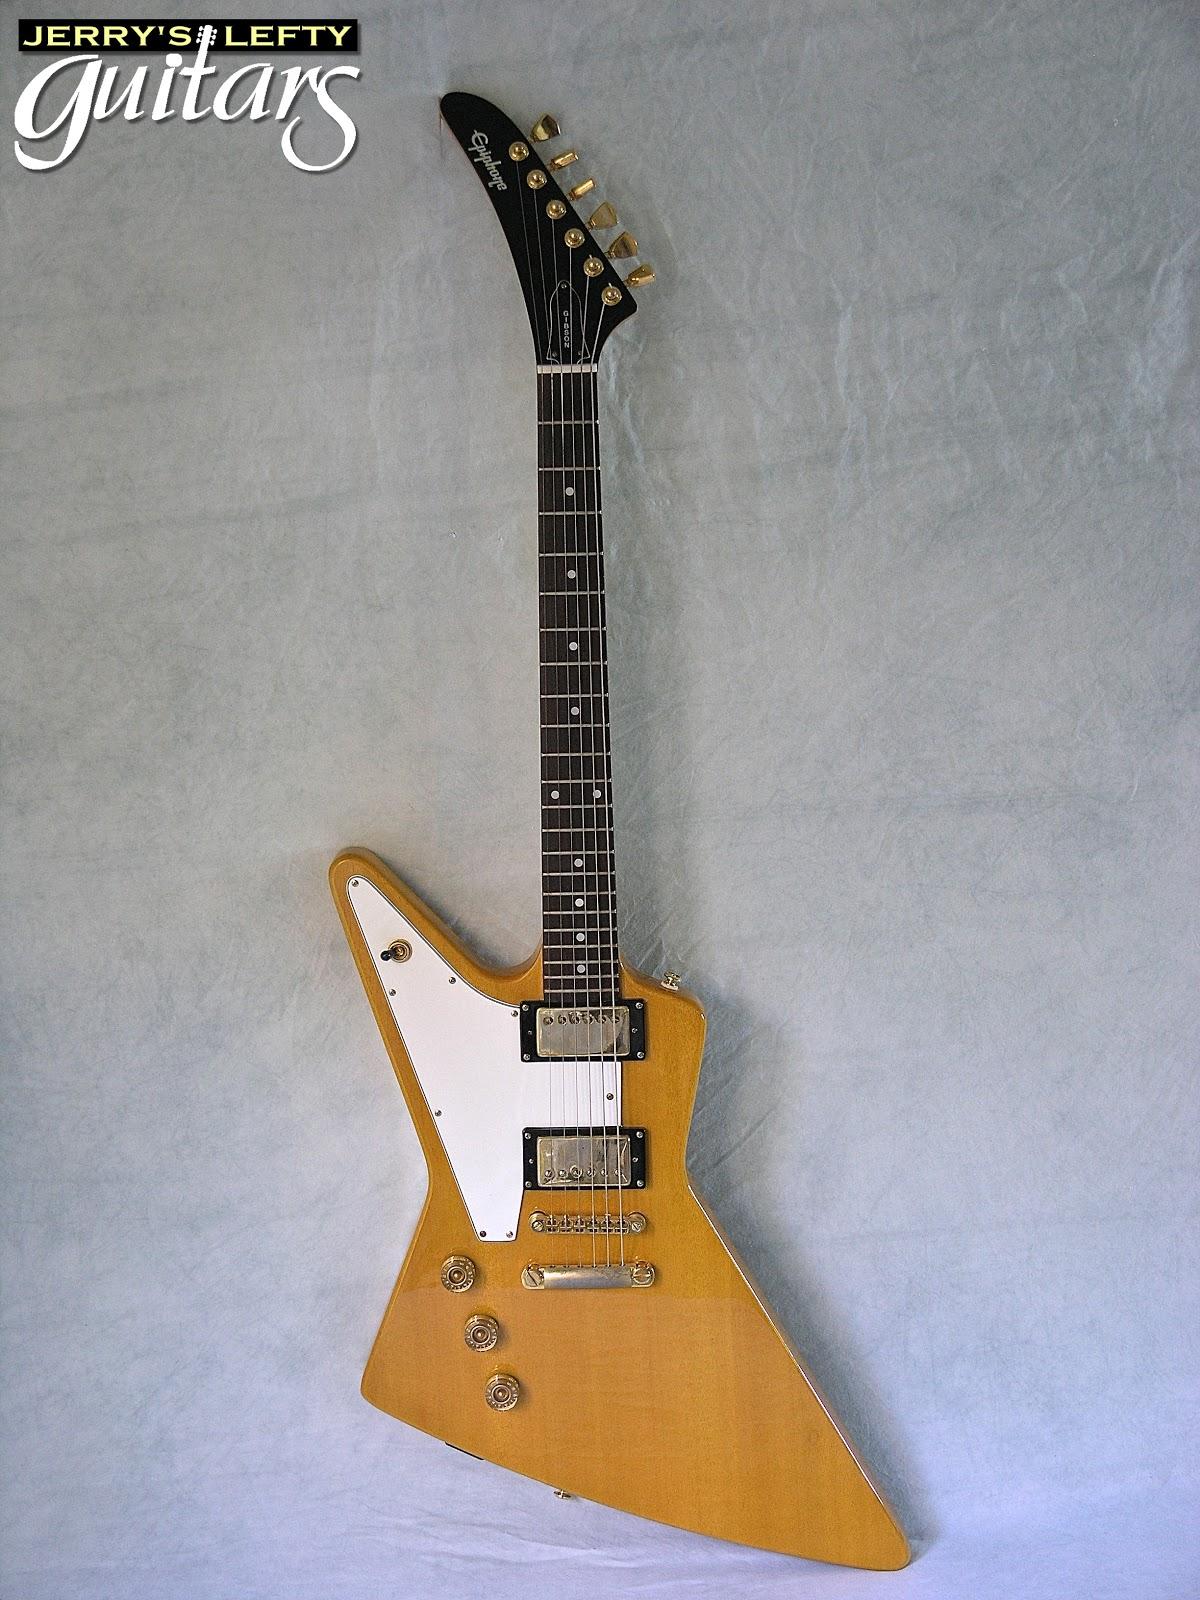 jerry 39 s lefty guitars newest guitar arrivals updated weekly 1999 epiphone korina explorer. Black Bedroom Furniture Sets. Home Design Ideas